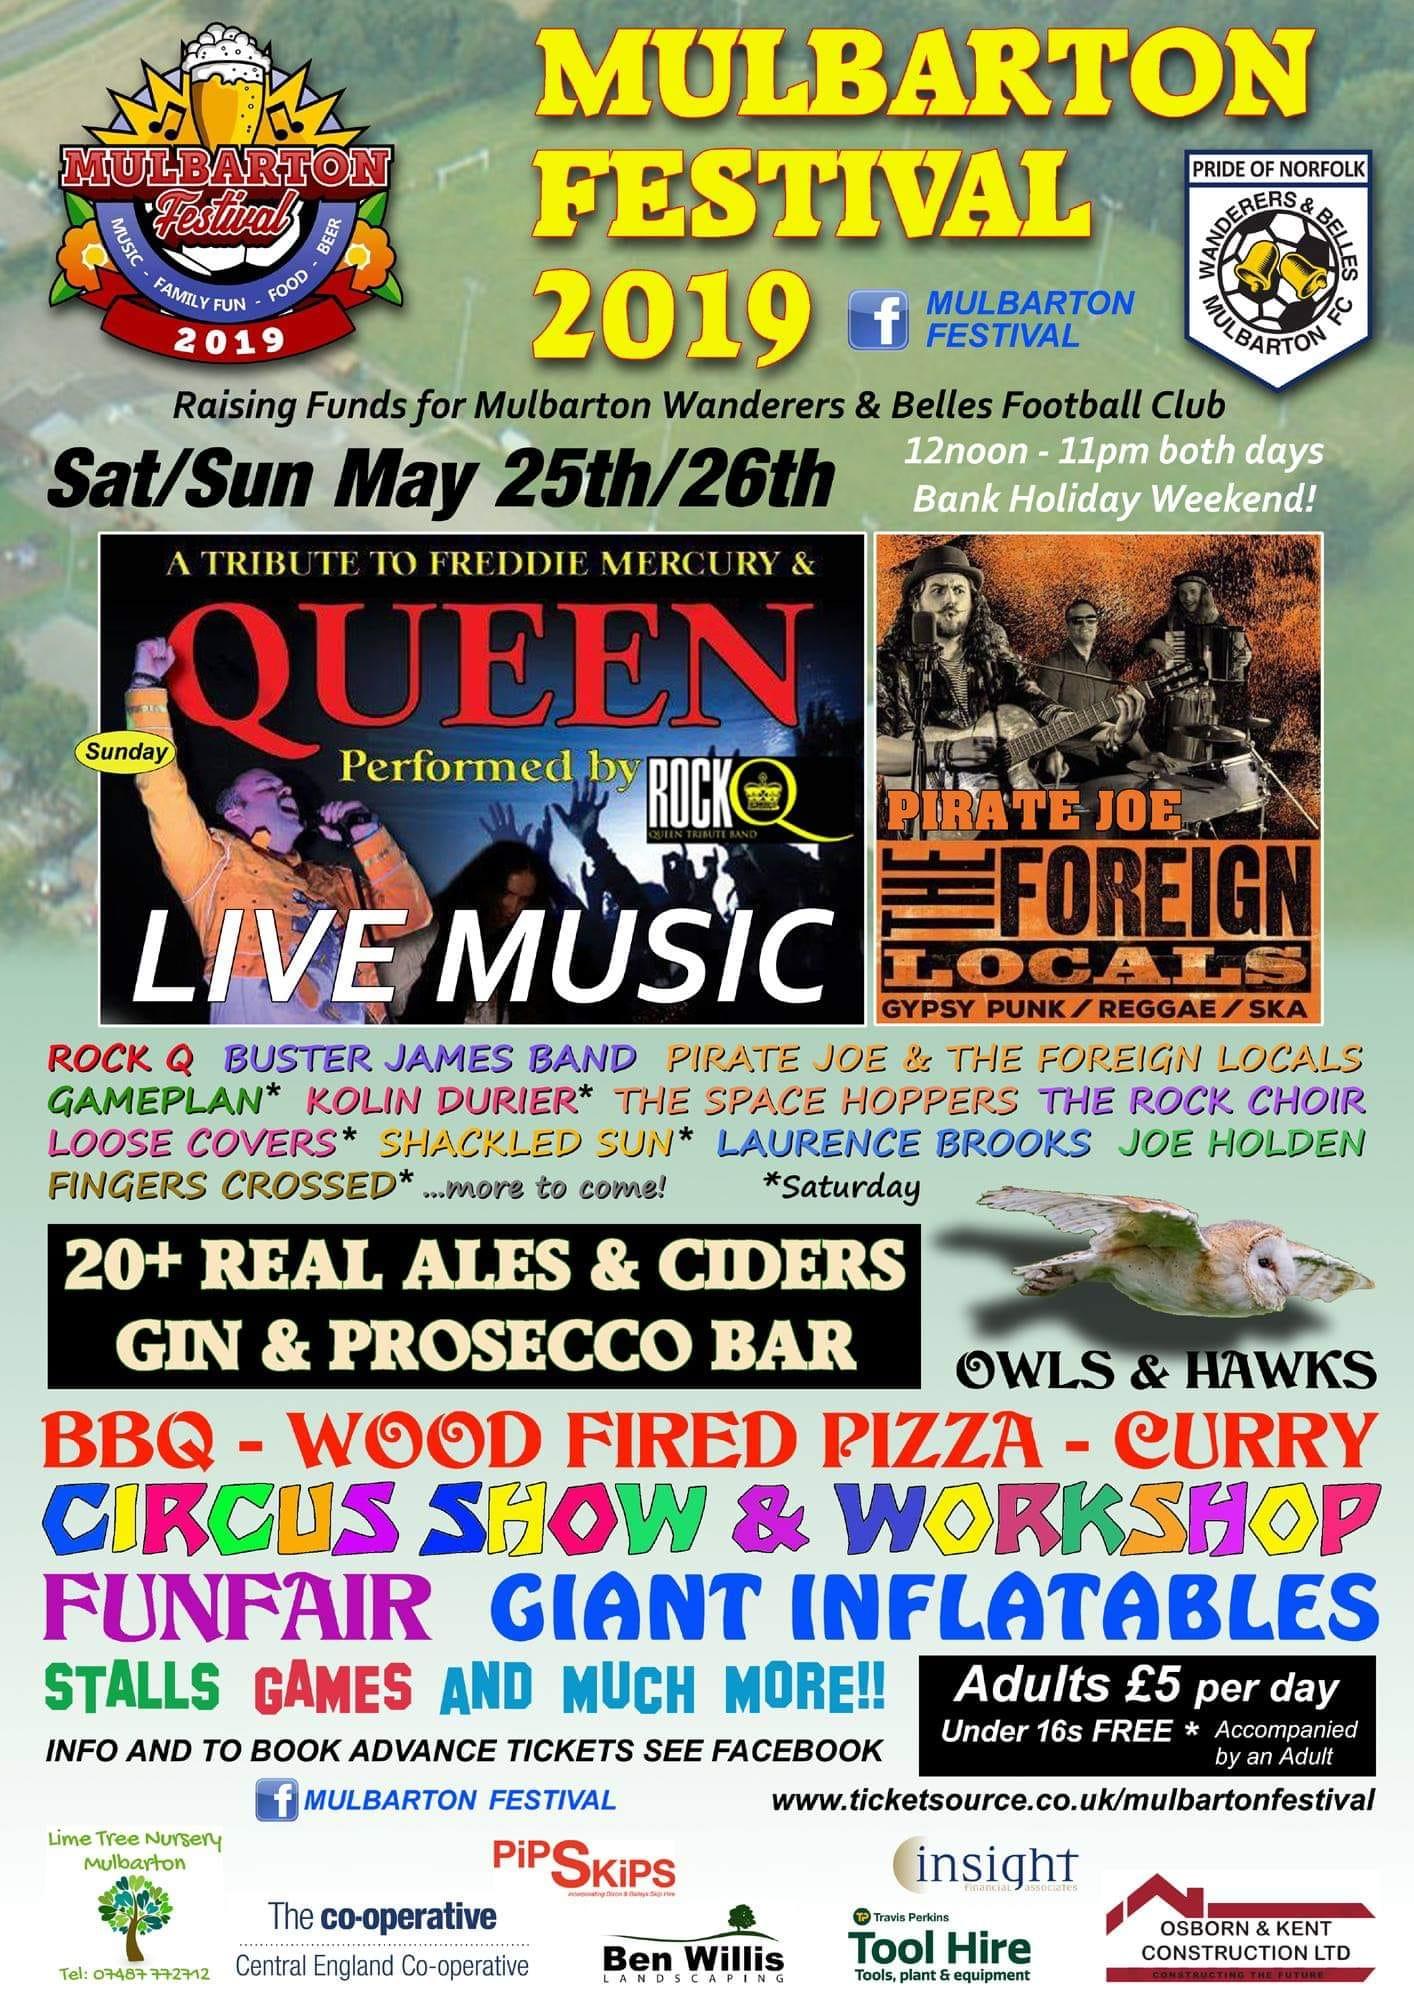 Mulbarton Festival 2019